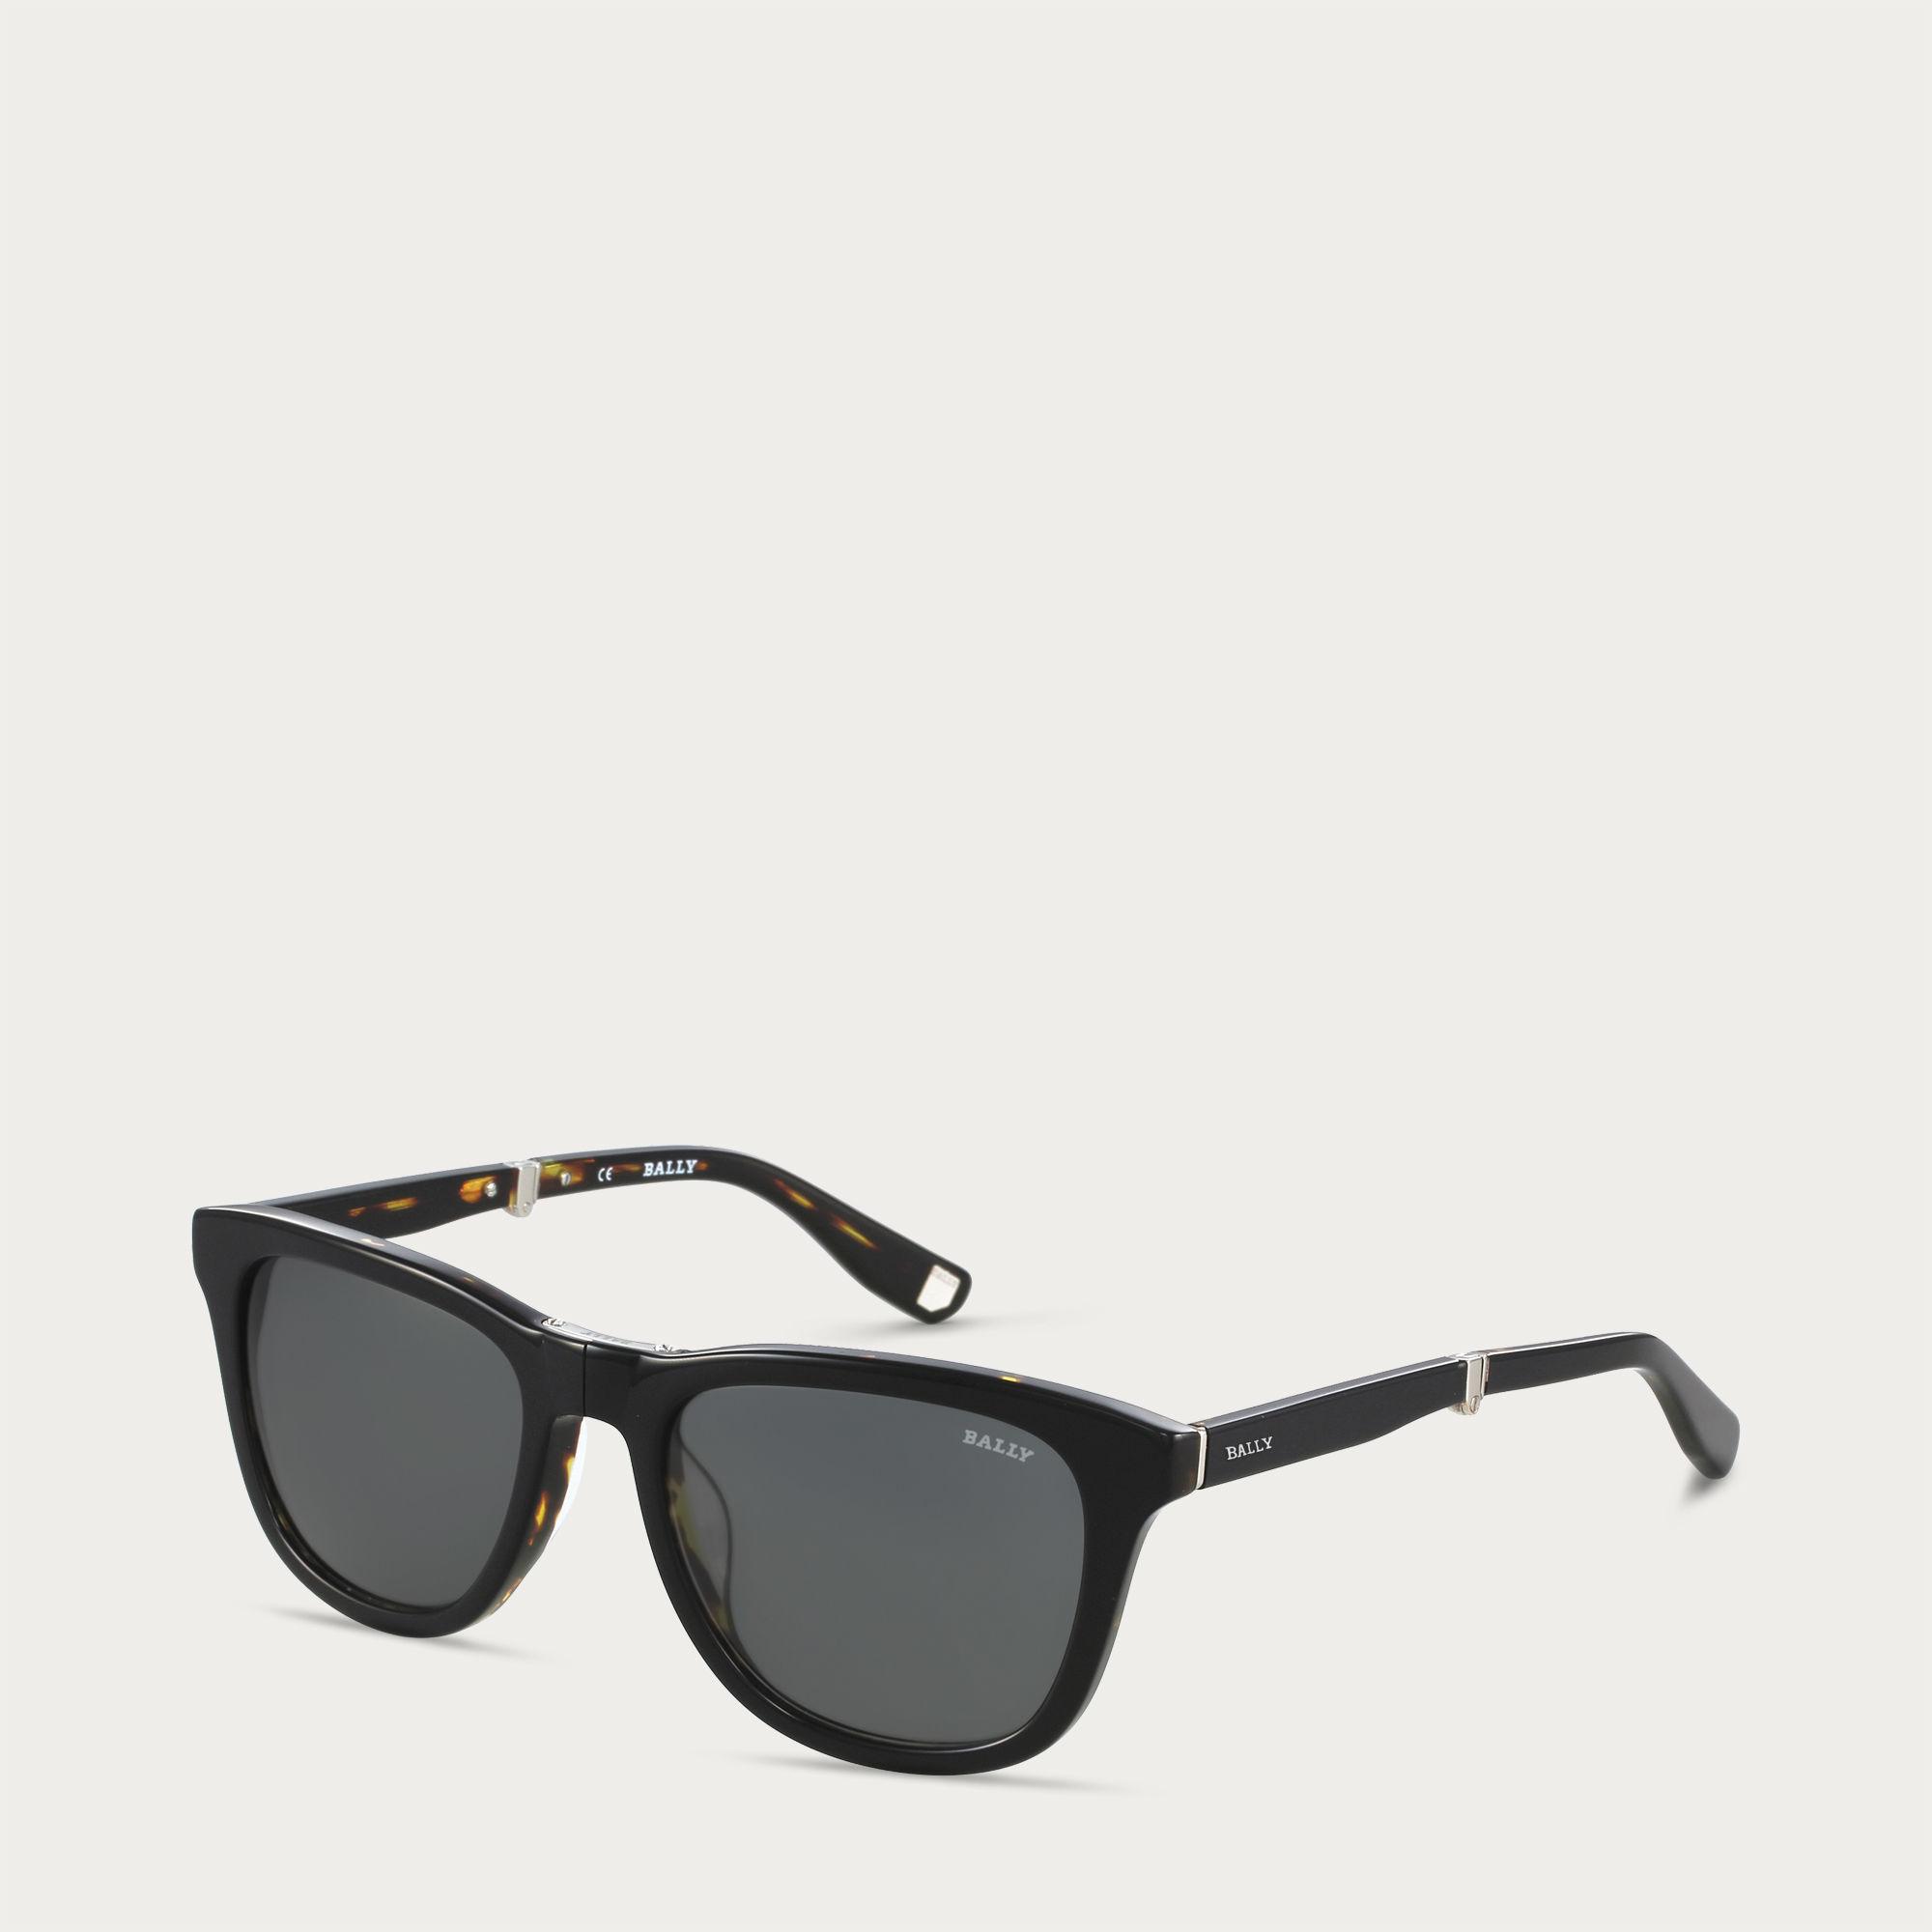 adff004968 Tj Maxx Oakley Sunglasses